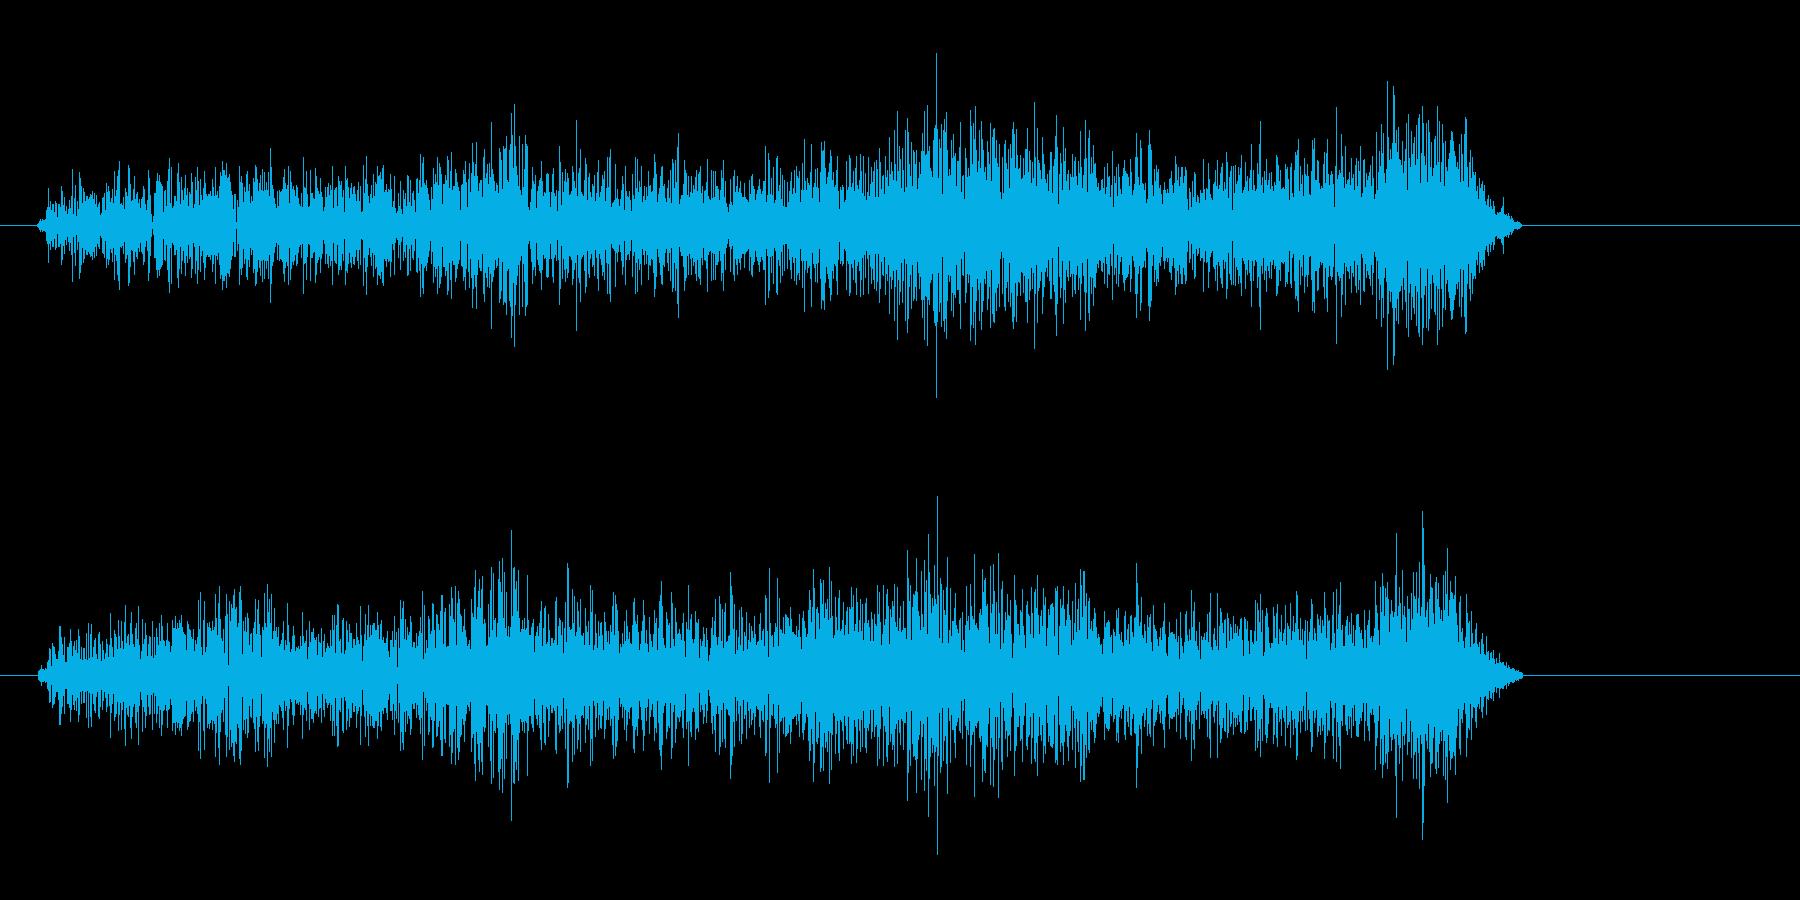 HPの回復(ゲーム)の再生済みの波形